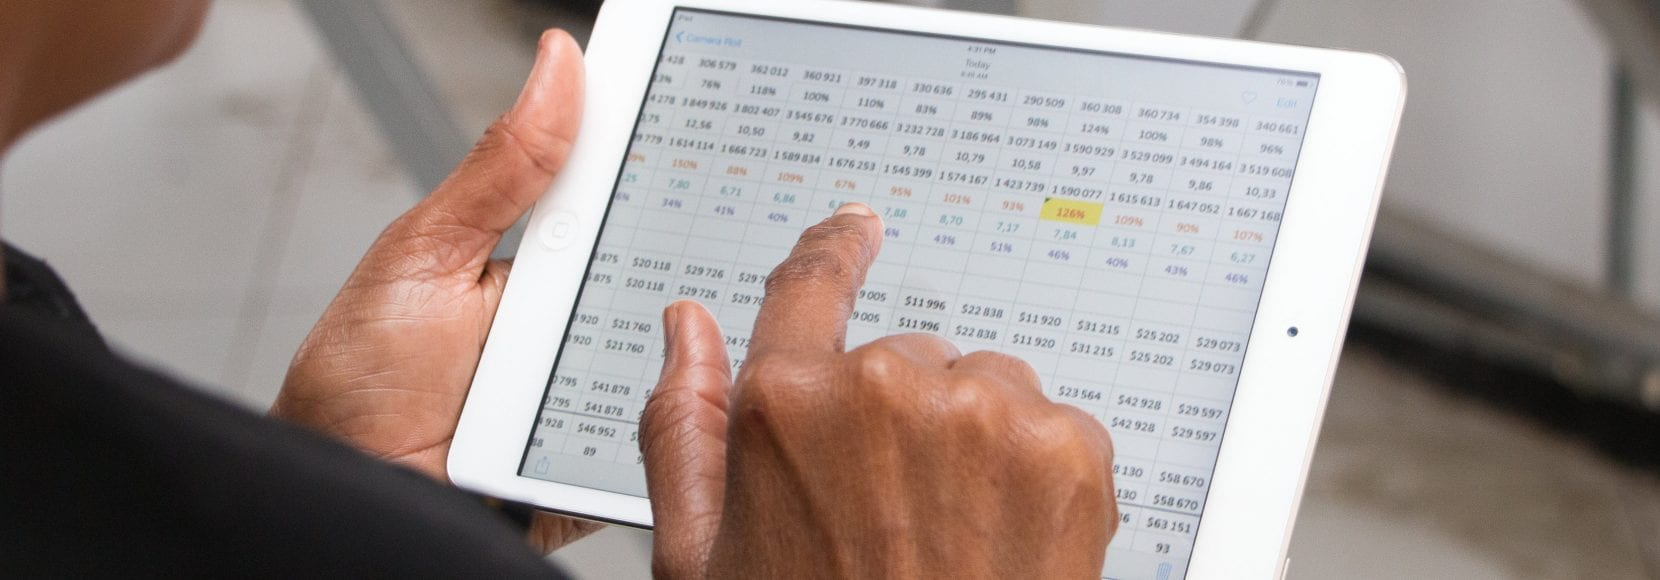 Tanzanian woman uses tablet at food processing business